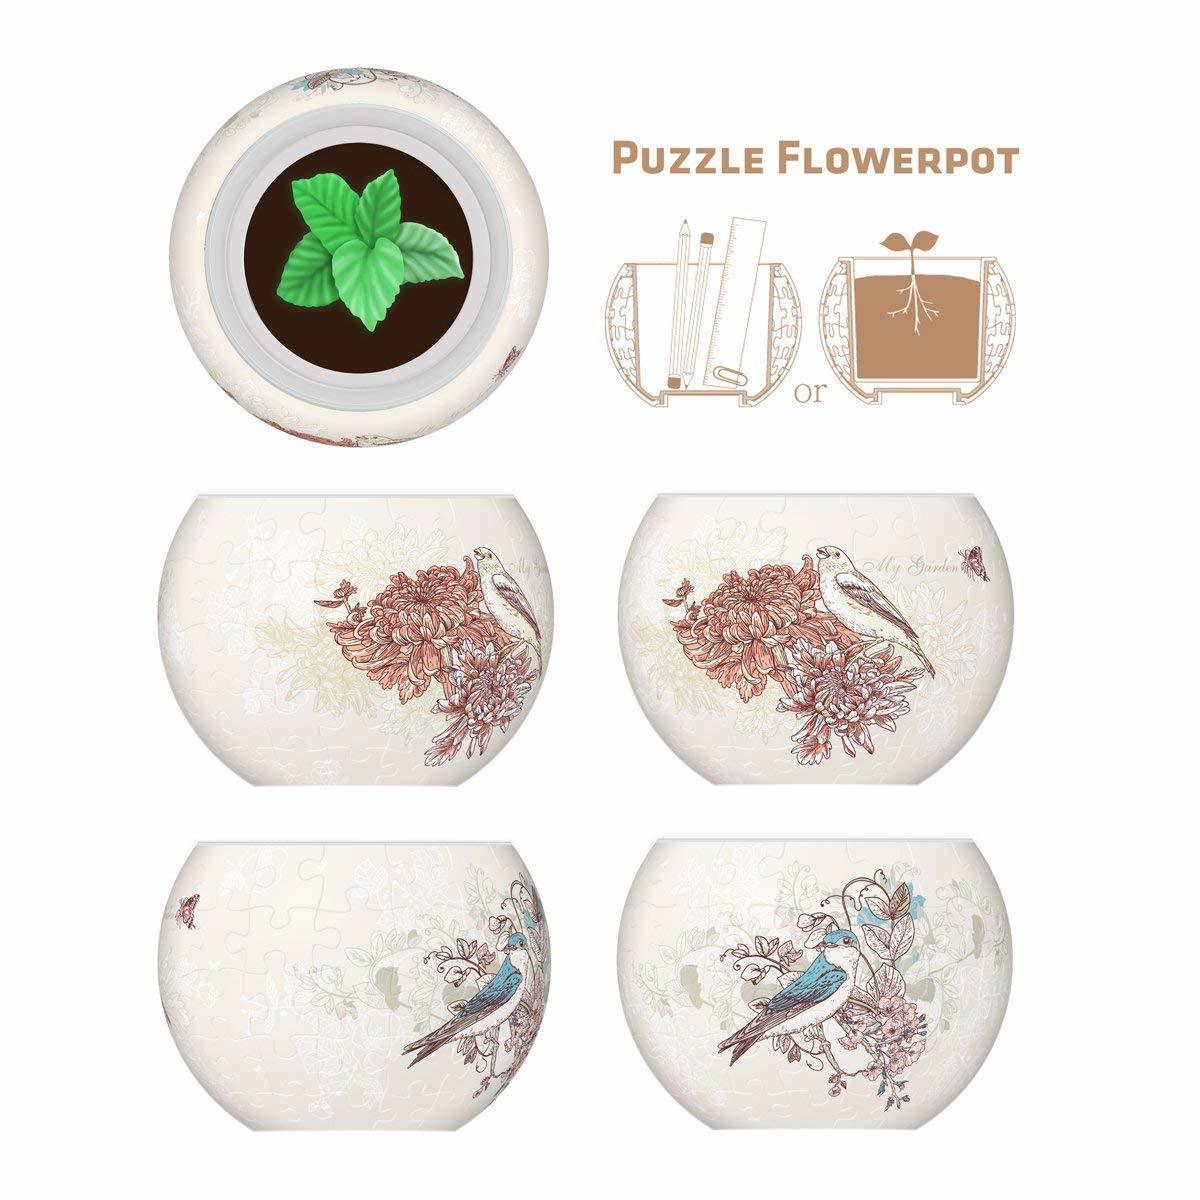 Pintoo: 80-Piece Puzzle Flower Pot - Singing Birds & Flowers image